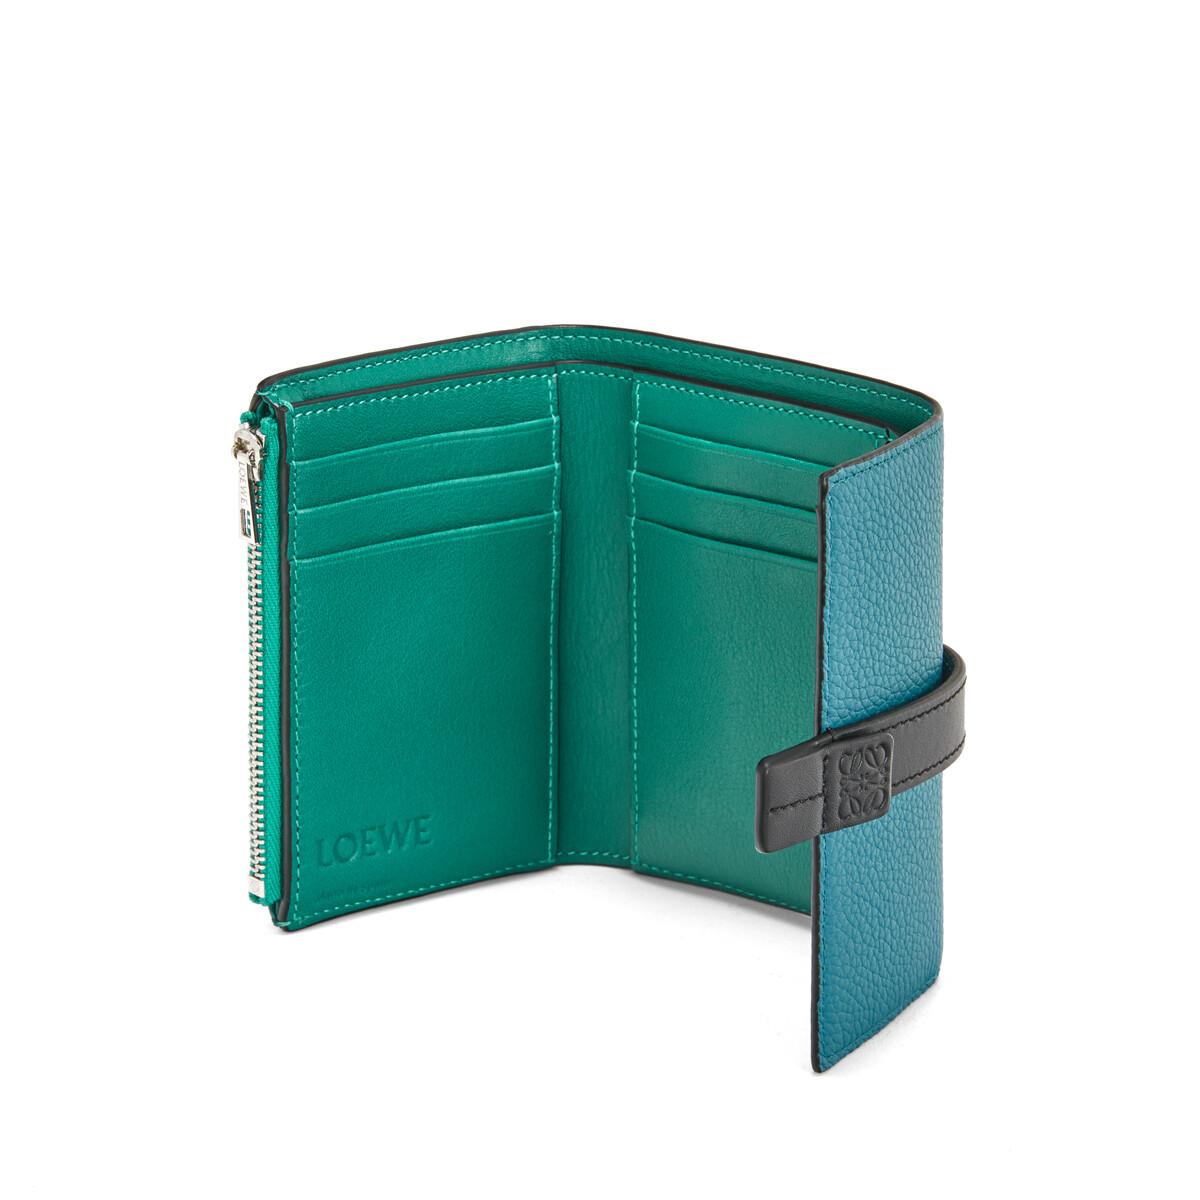 LOEWE Small Vertical Wallet Dark Lagoon front